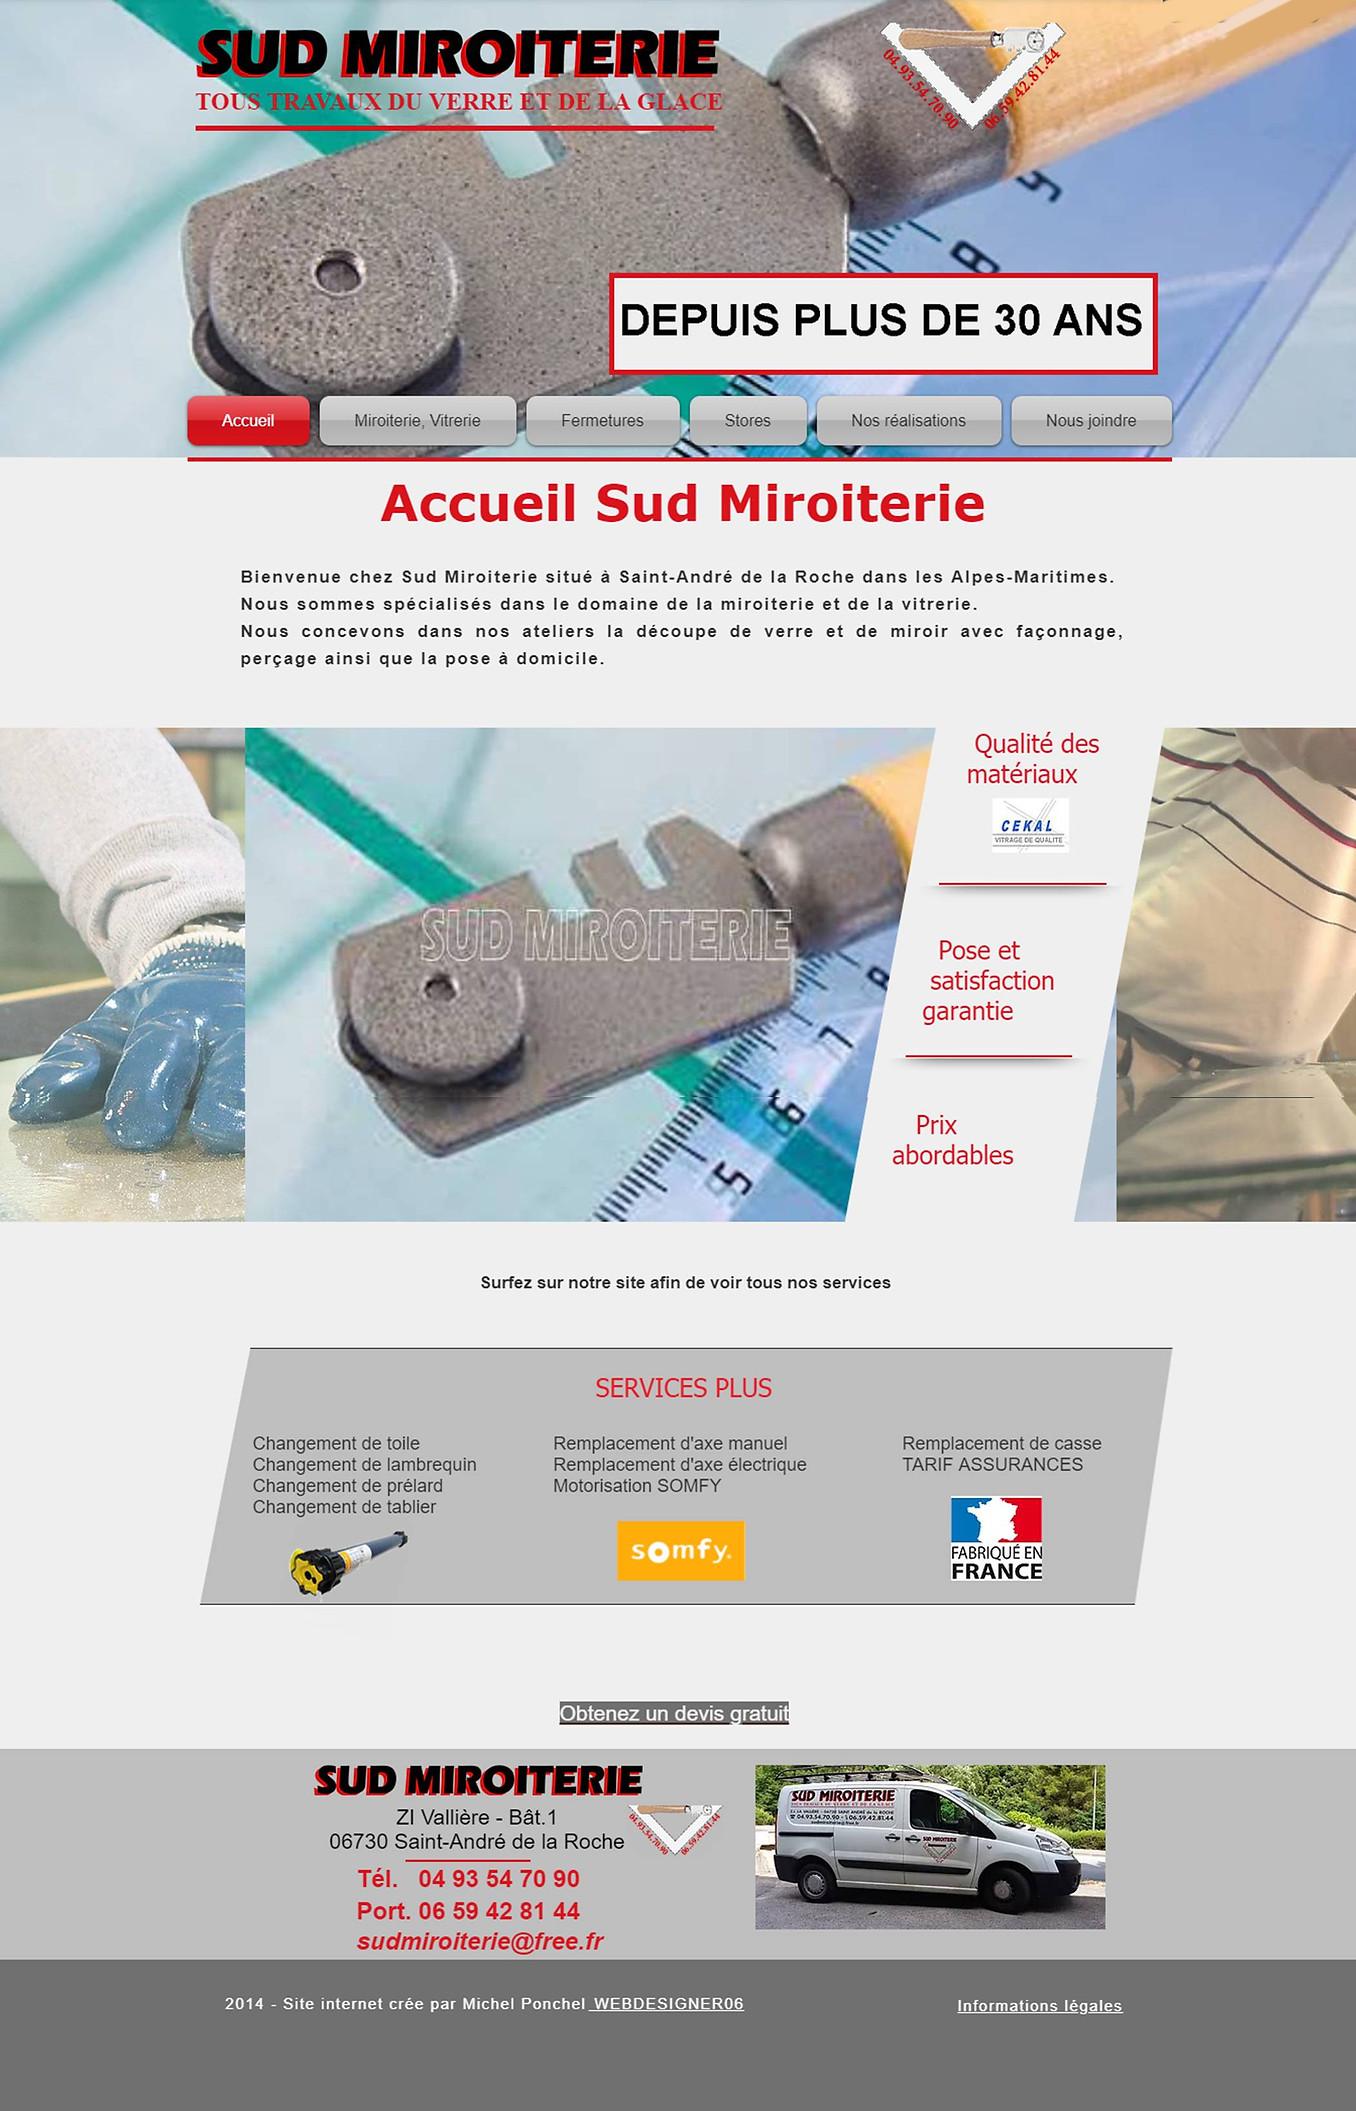 Sud Miroiterie by Webdesigner06